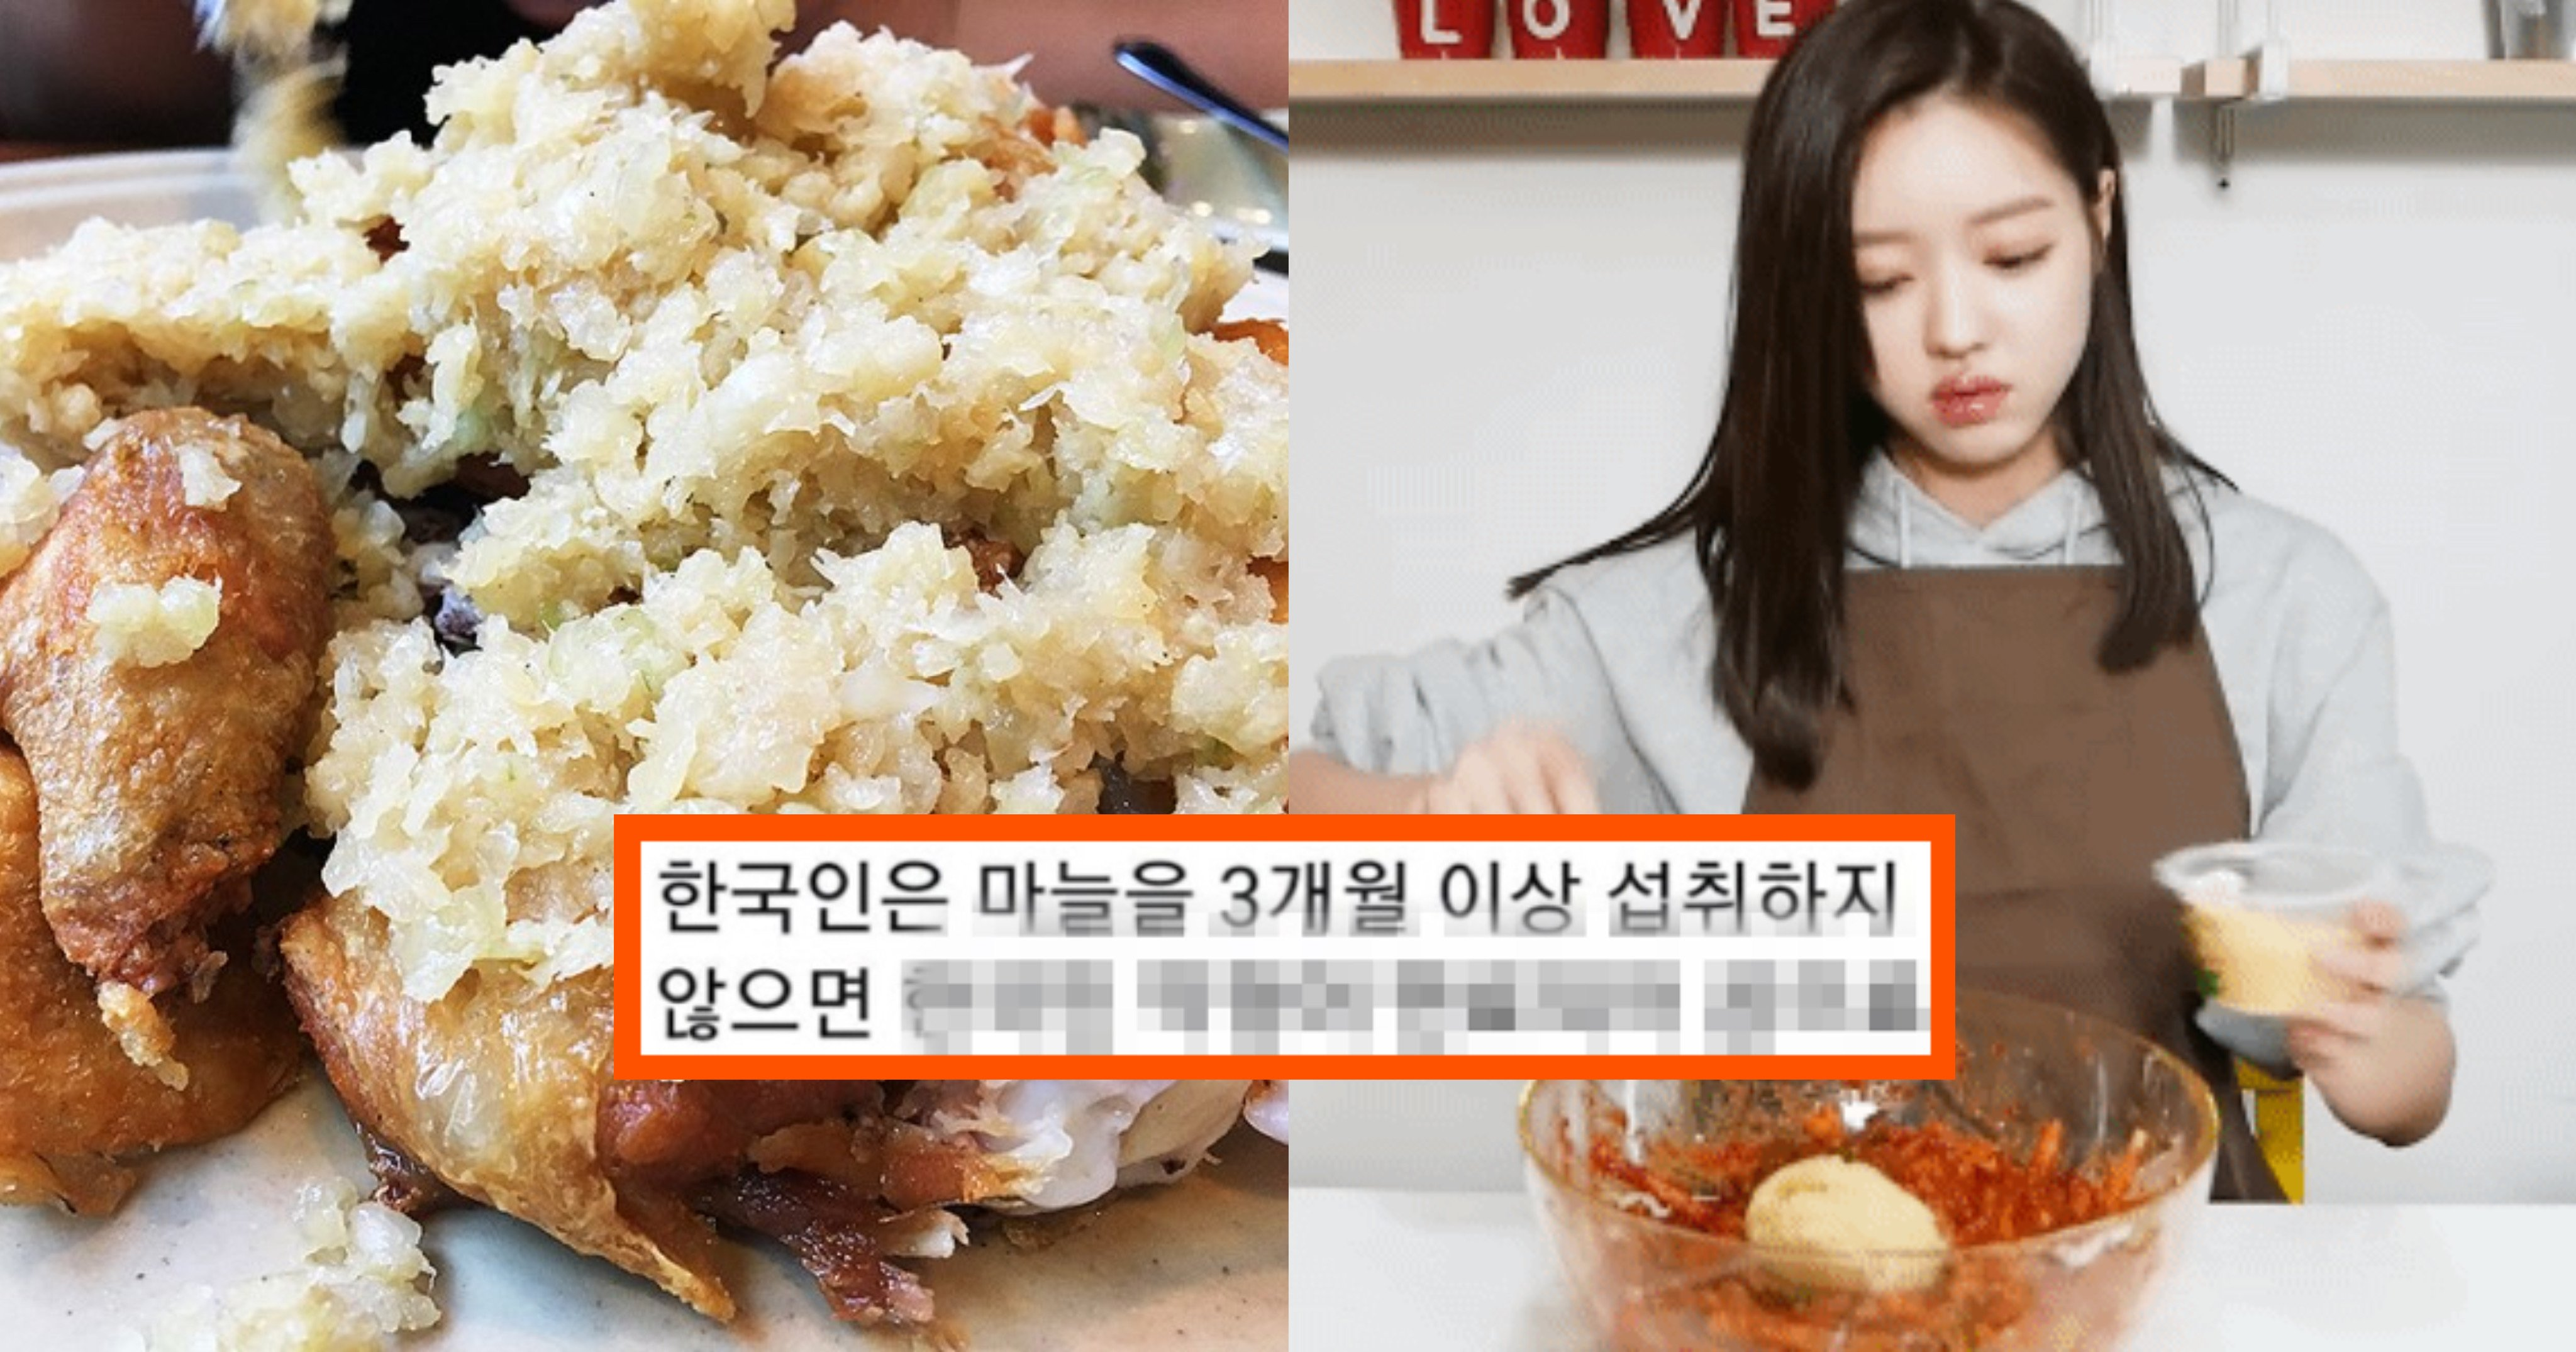 "kakaotalk 20210301 203021862.jpg?resize=412,232 - ""마늘을 안먹으면 한국인은...""커뮤니티에 공개된 한국인이 마늘 없이 절대 살 수 없는 이유"